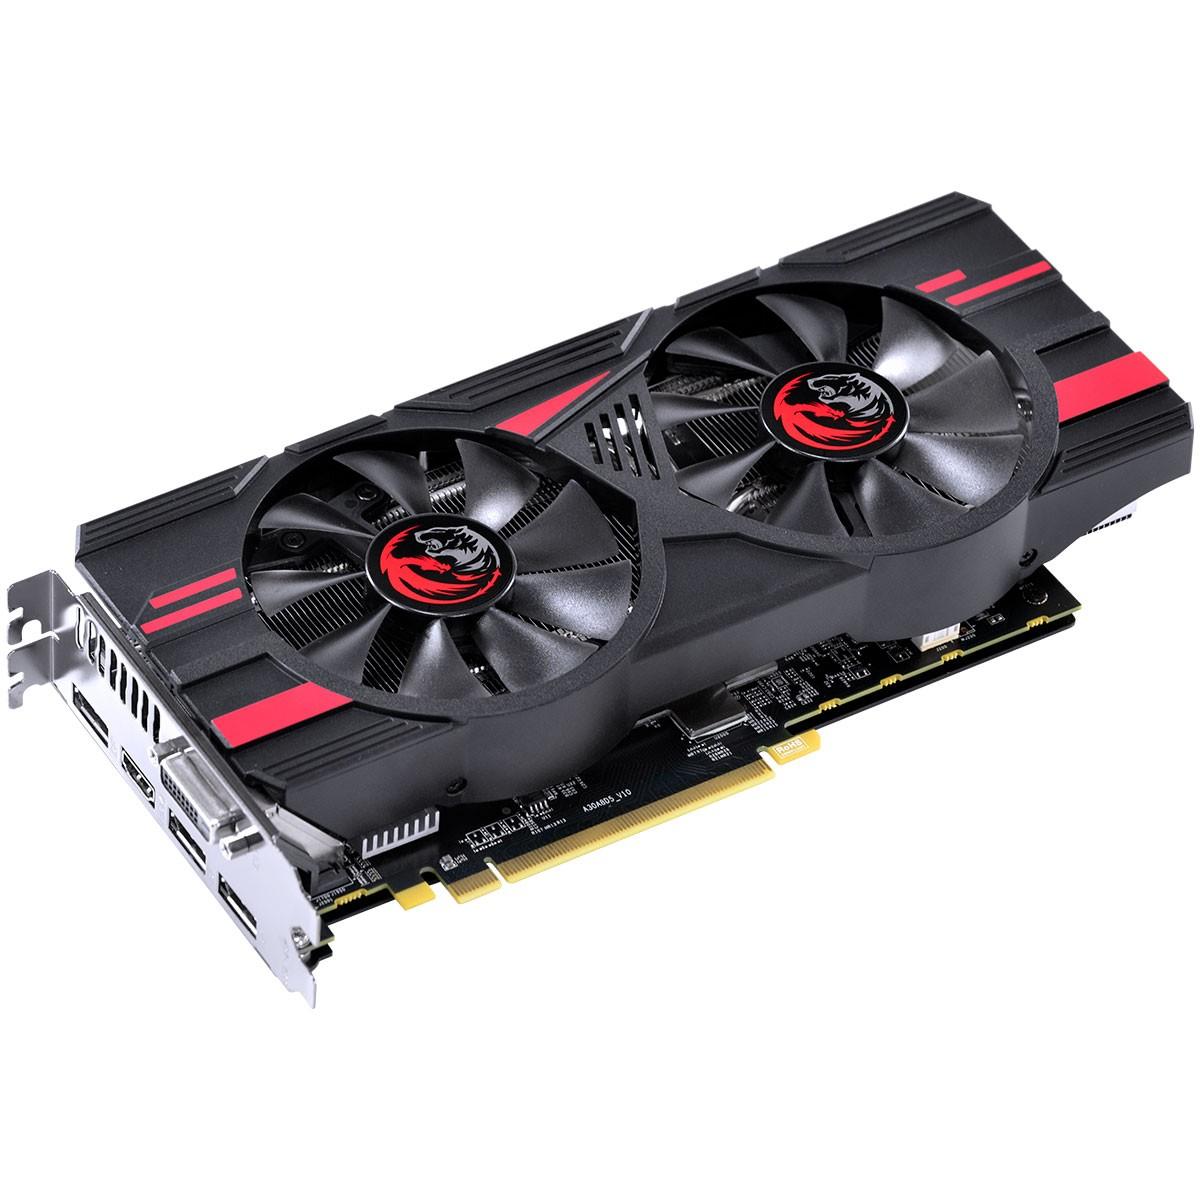 Placa de Vídeo PCyes Radeon RX 580 Dual Graffiti Series, 8GB GDDR5, 256Bit, PJ580RX25608G5DF